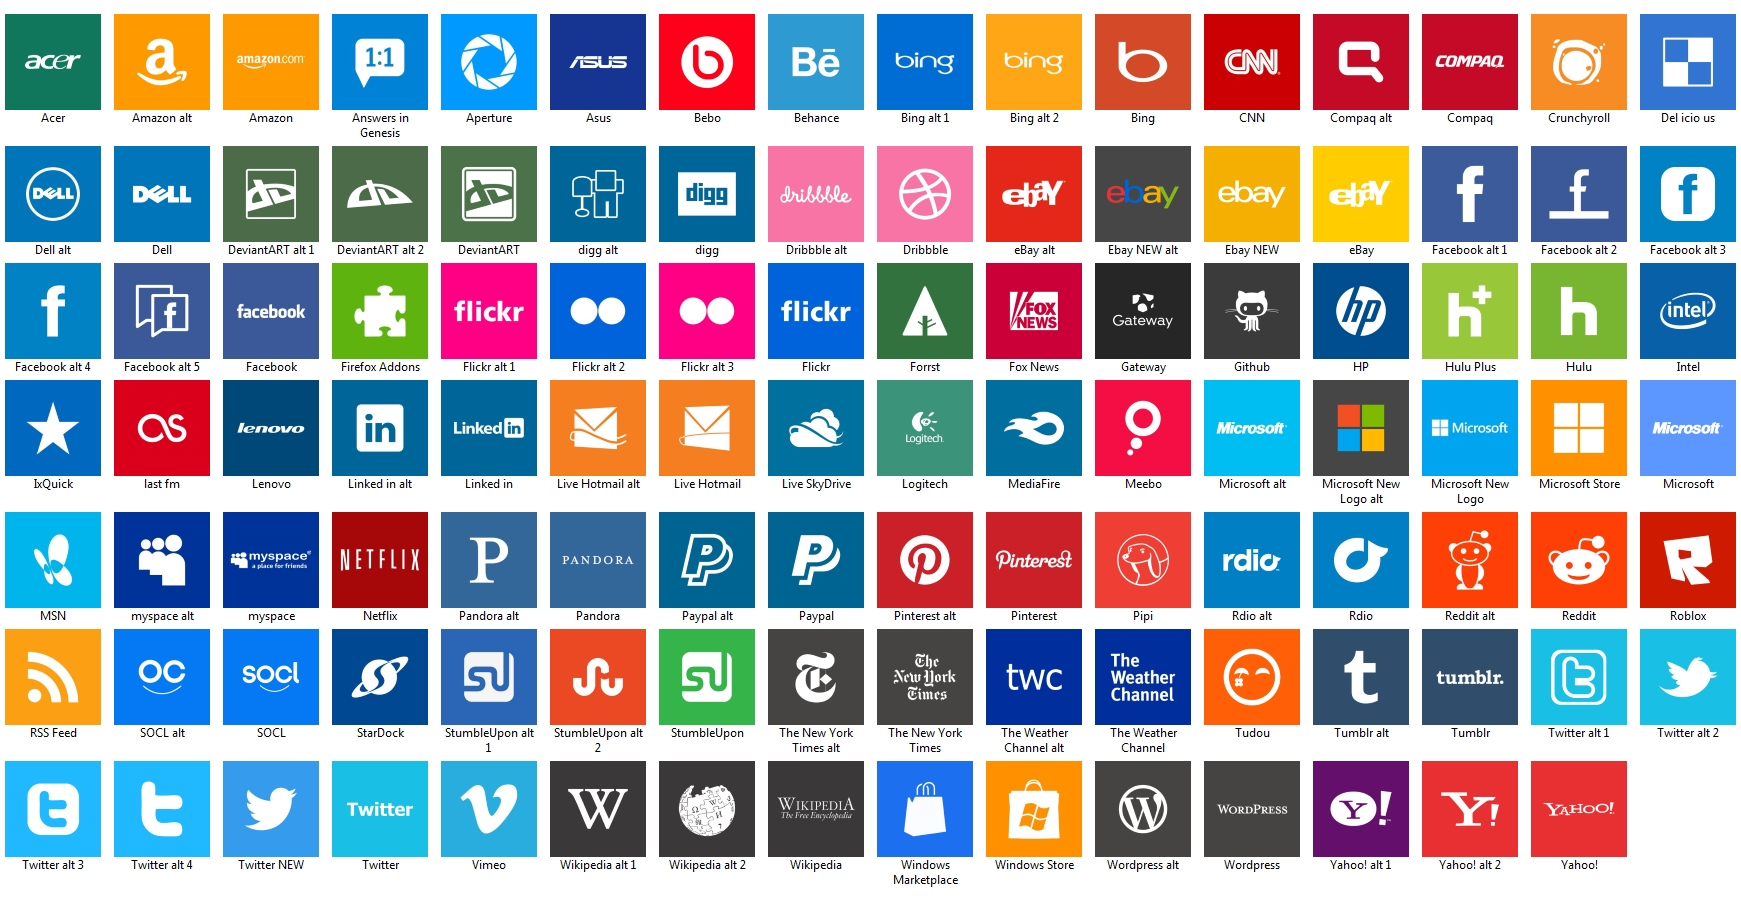 17 Windows 8 Icon Pack Images - Windows 8 Metro Icon Pack, Windows 8